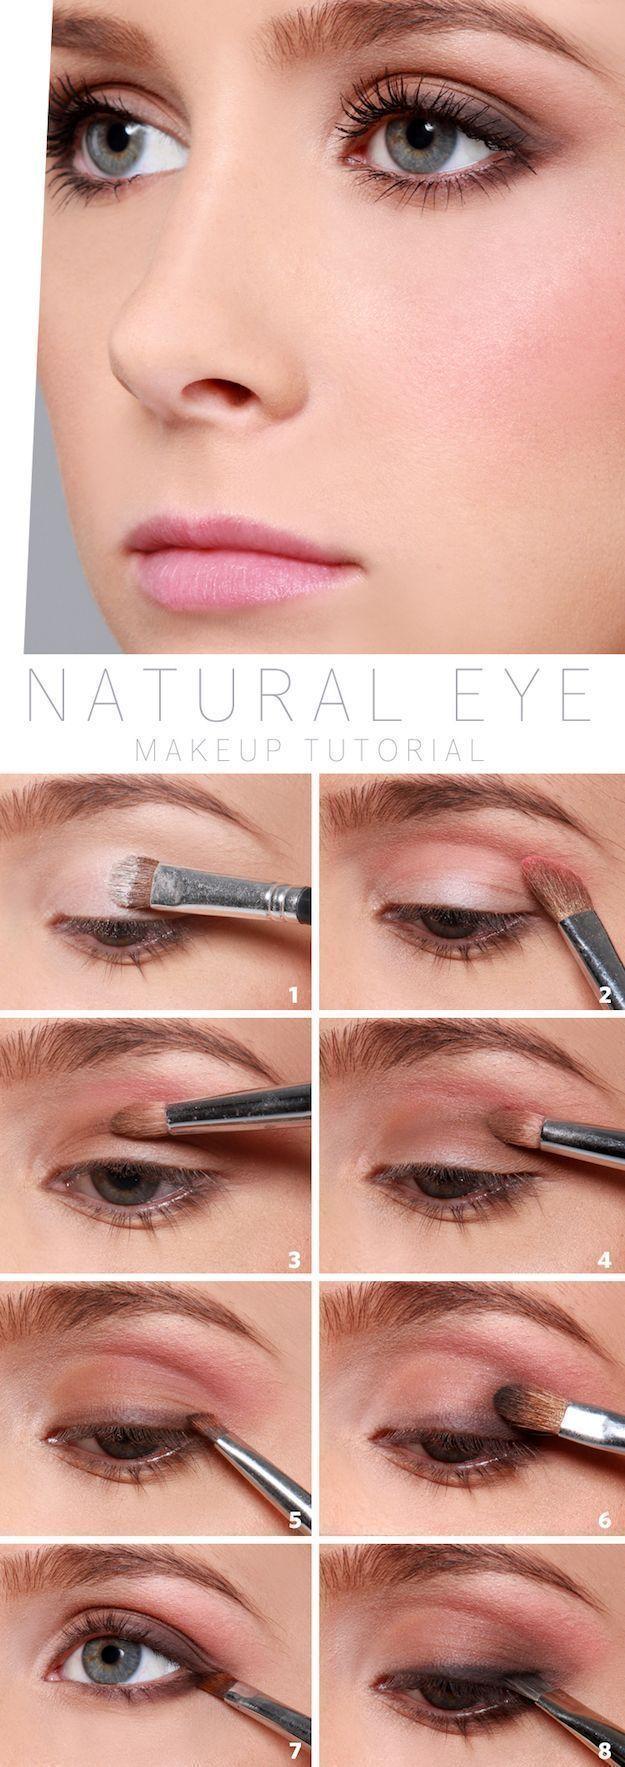 Wedding Makeup Ideas for Brides - Natural Eye Makeup Tutorial - Romantic make up...